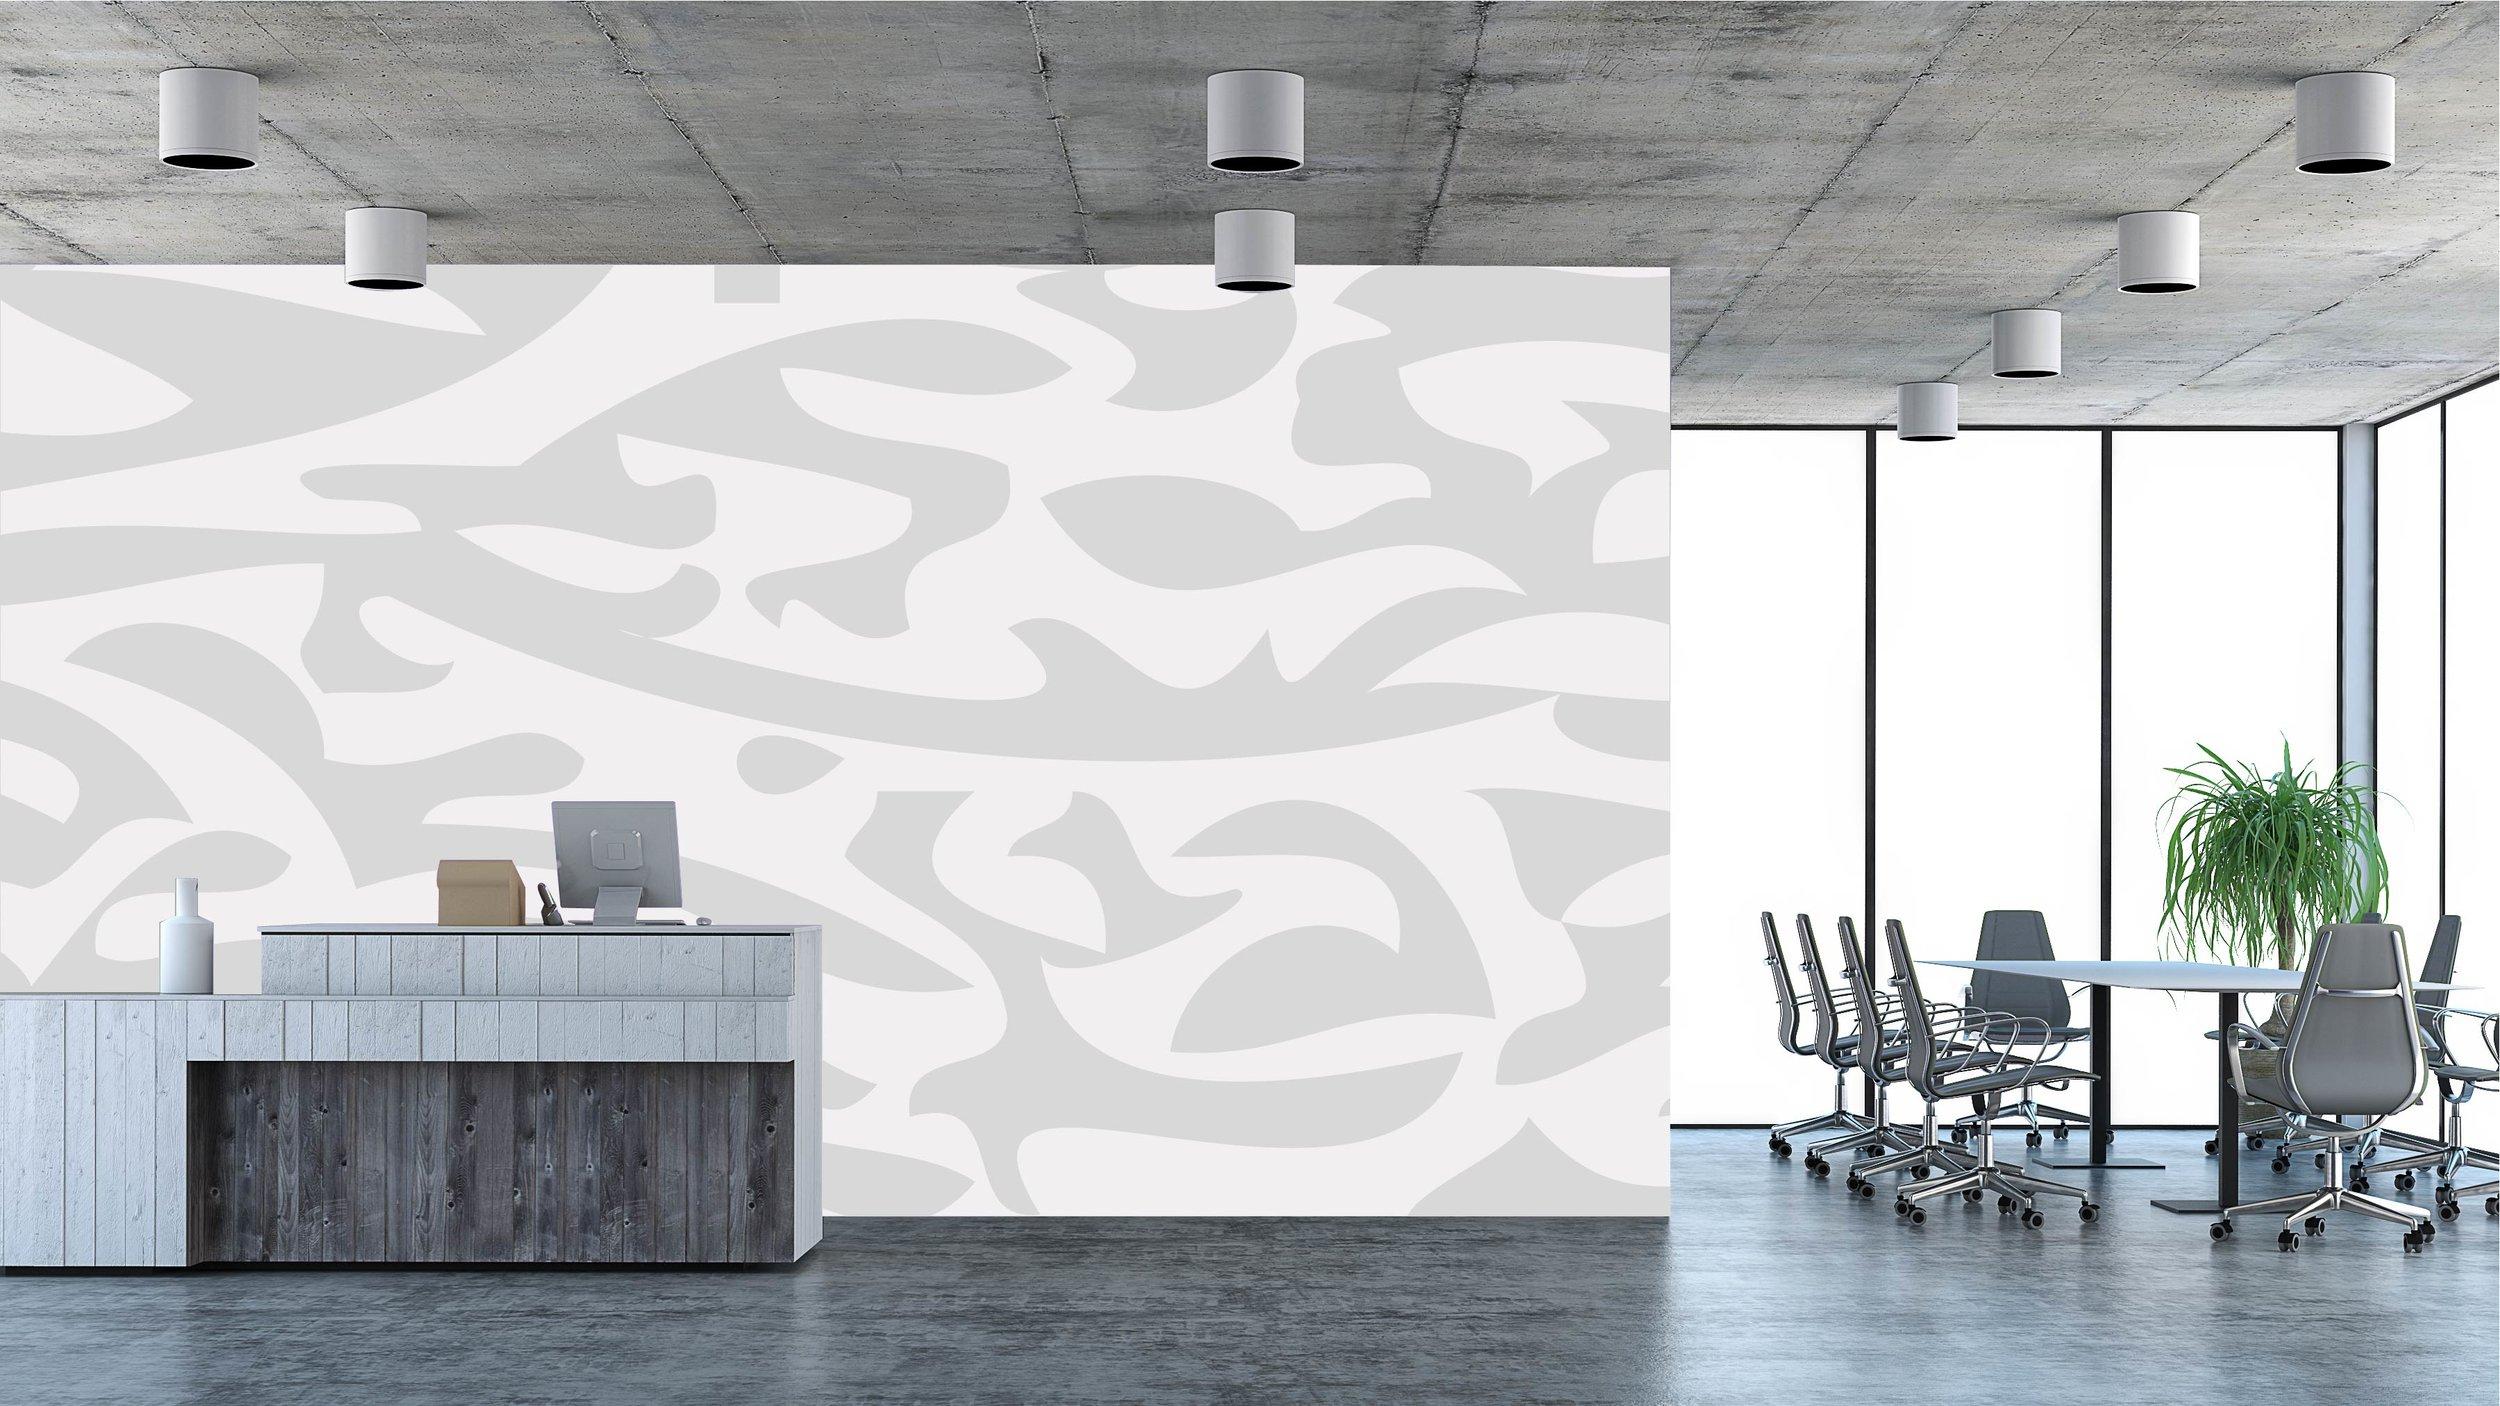 Wallpaper_Dreams-01.jpg